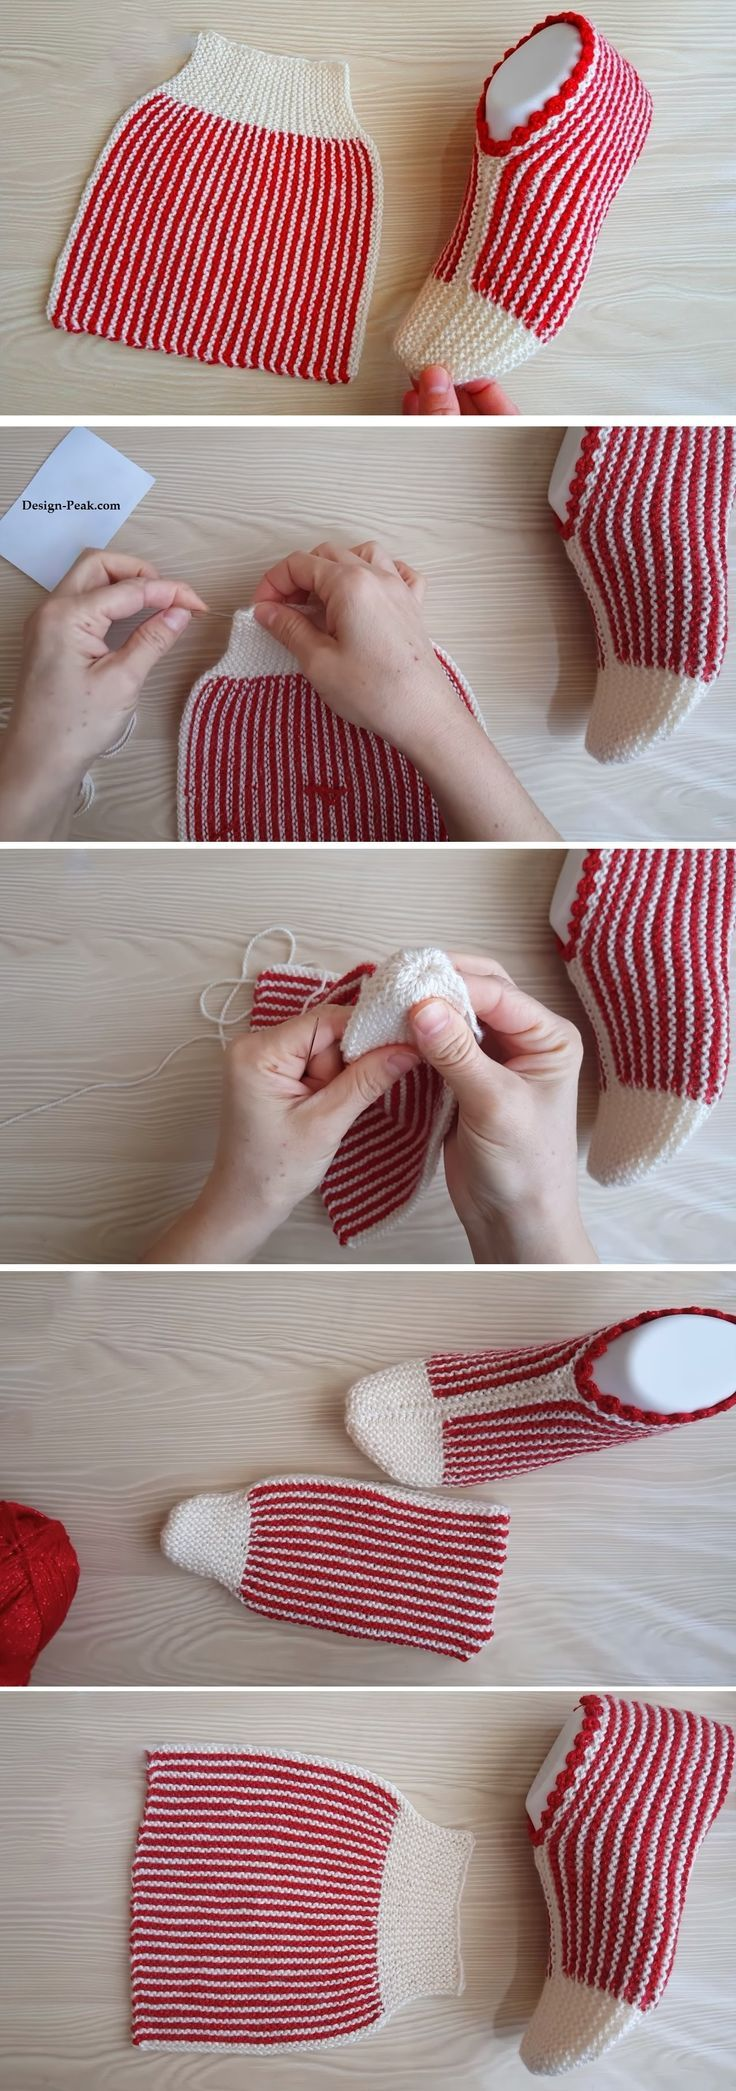 Simple Folded Slippers Tutorial